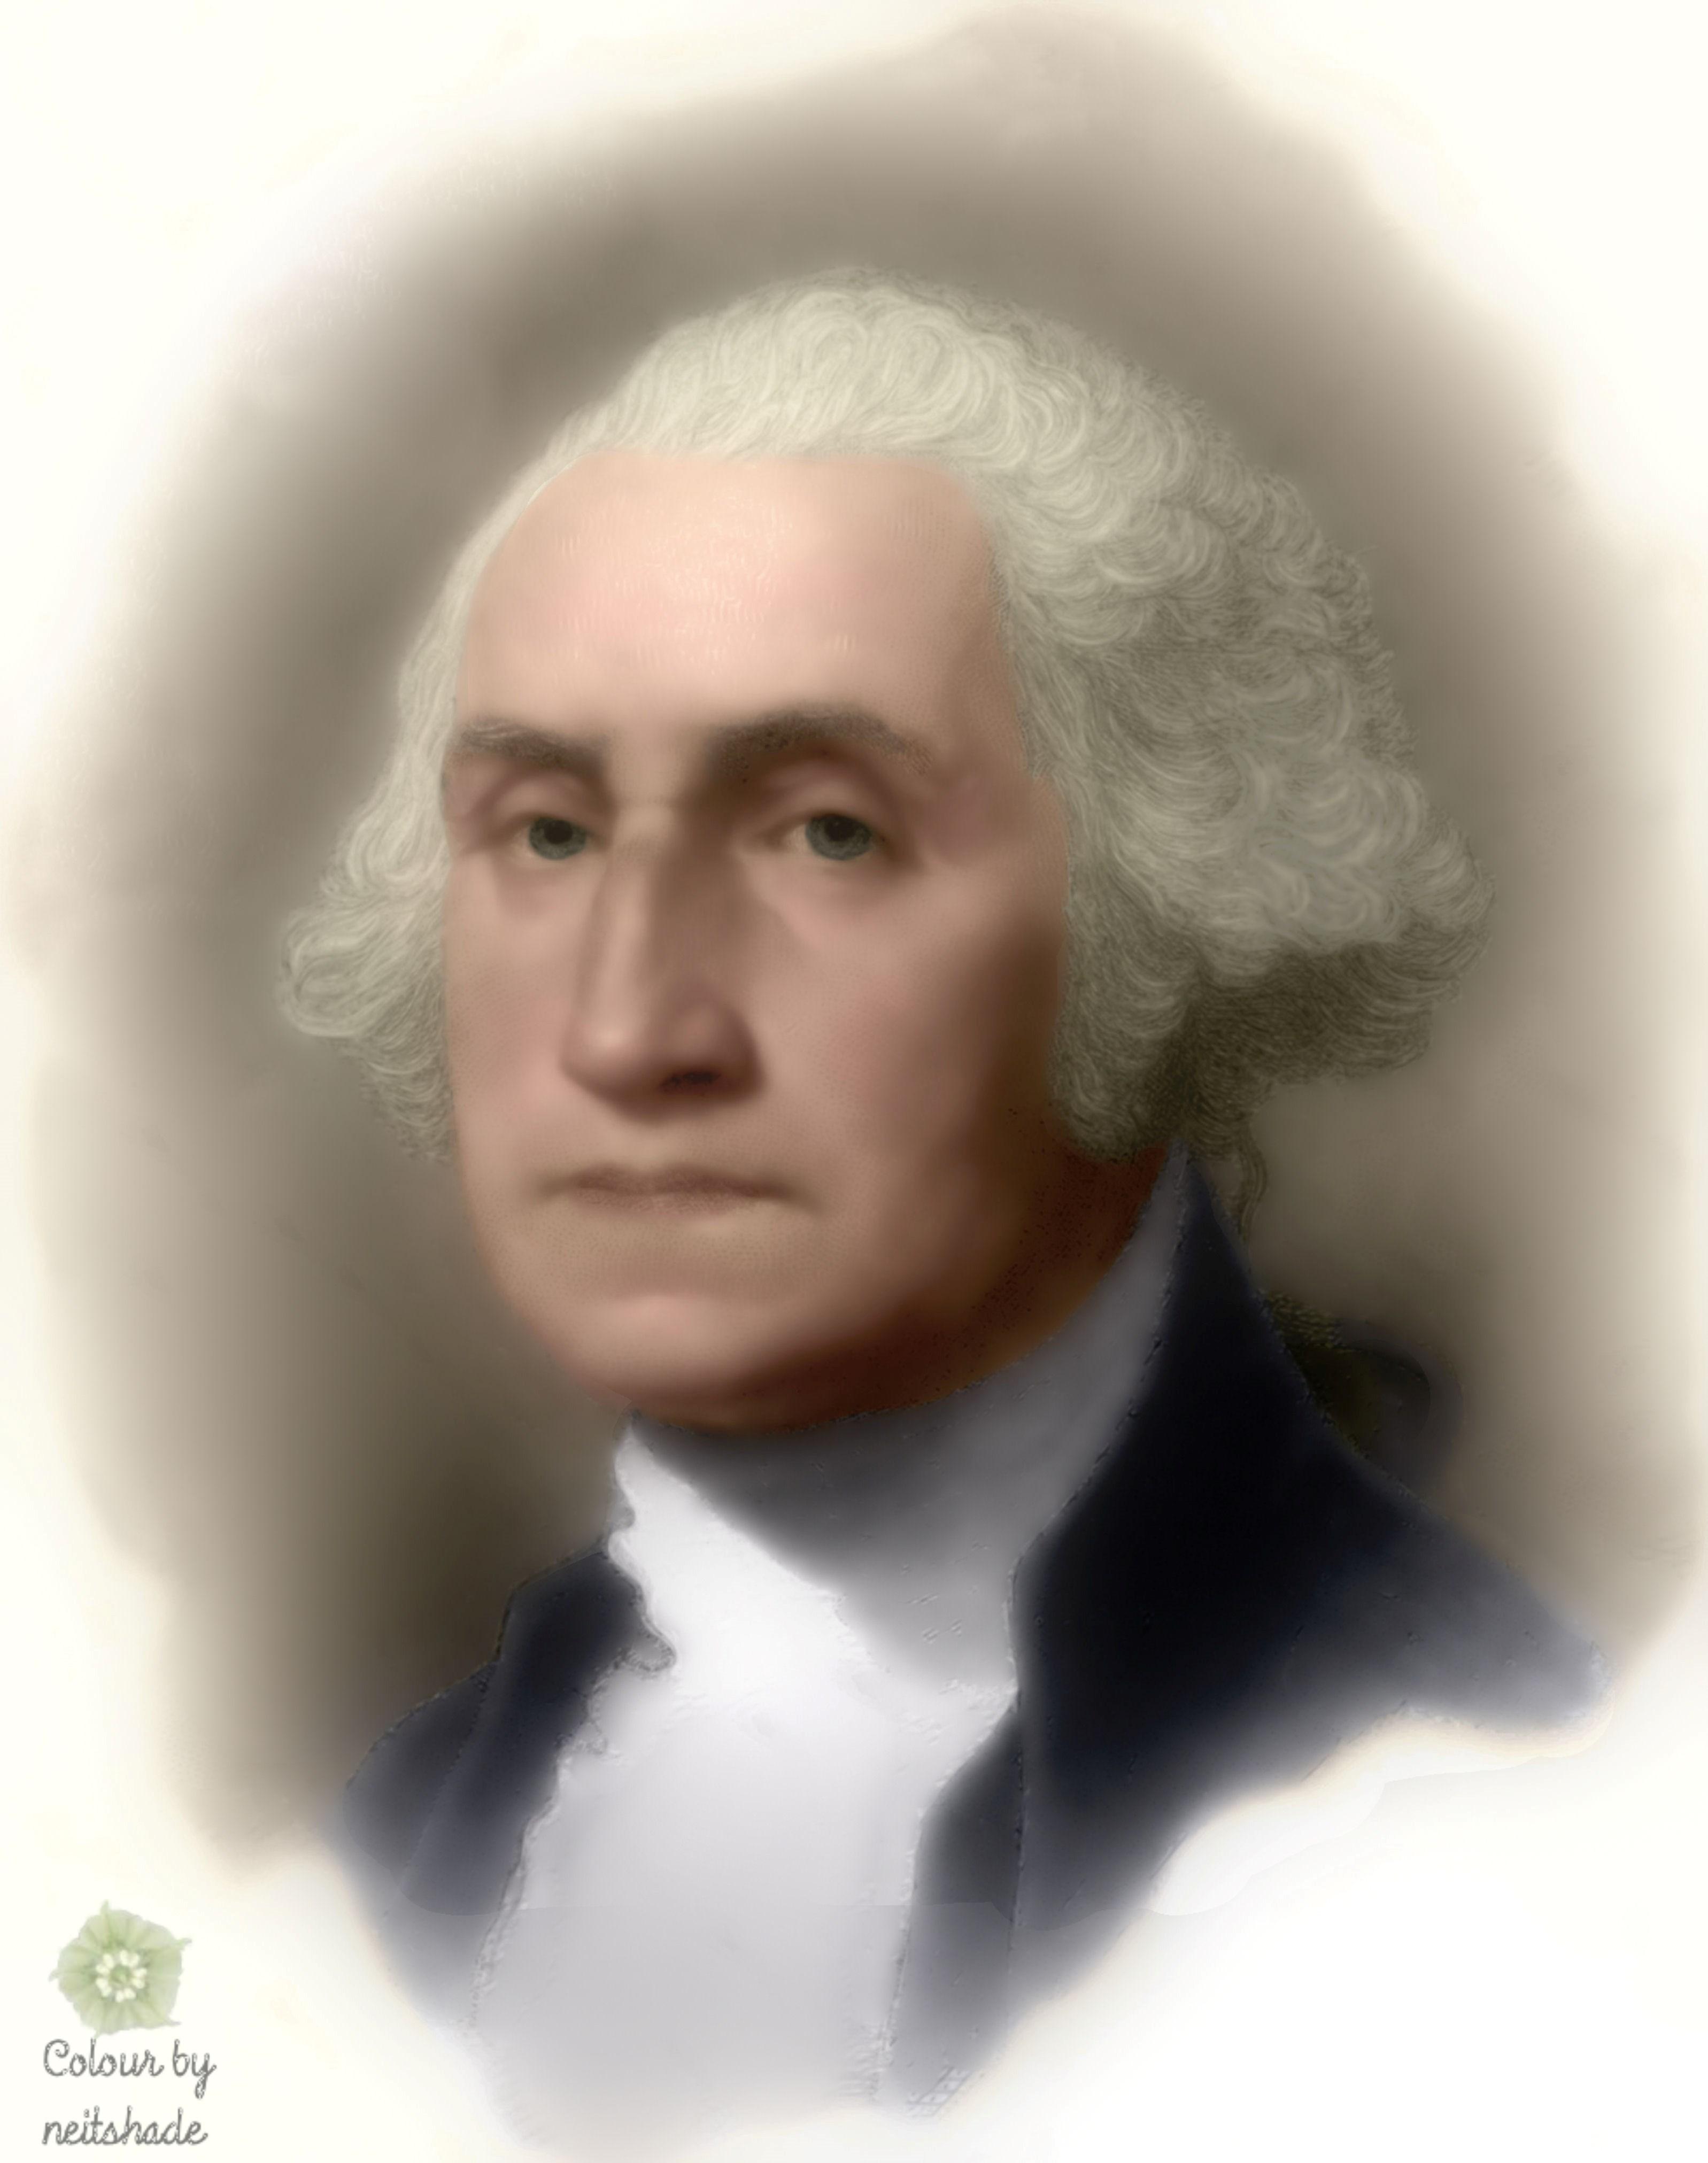 1789 George Washington George Washington Bust Portrait Engraving After Gilbert Stuart